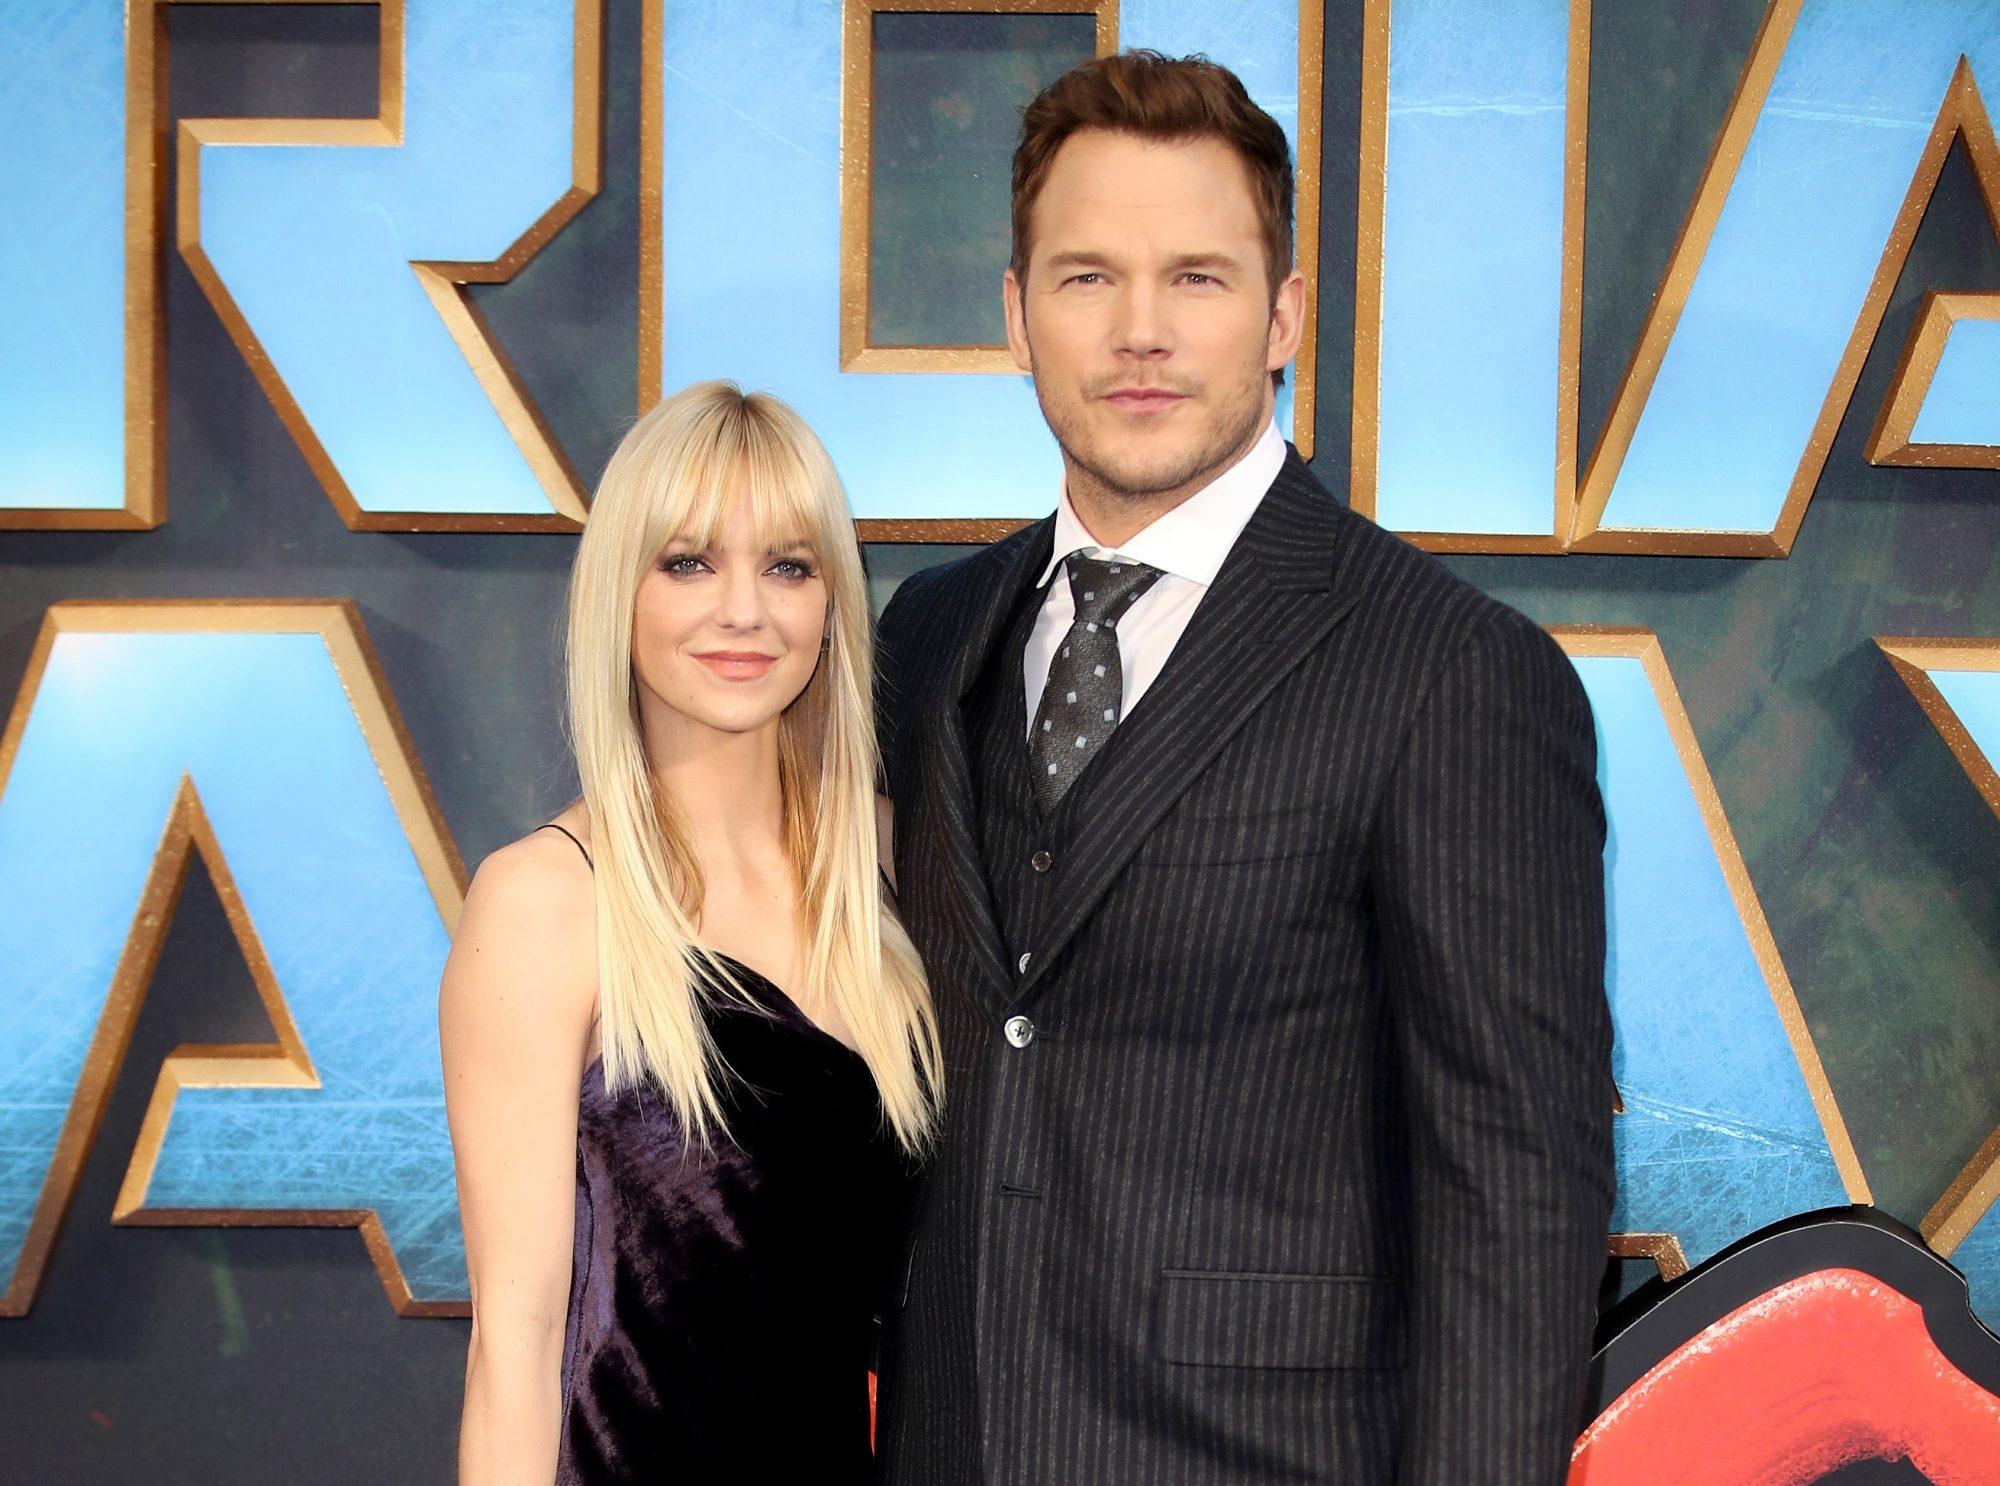 Image of Chris Pratt and Anna Faris